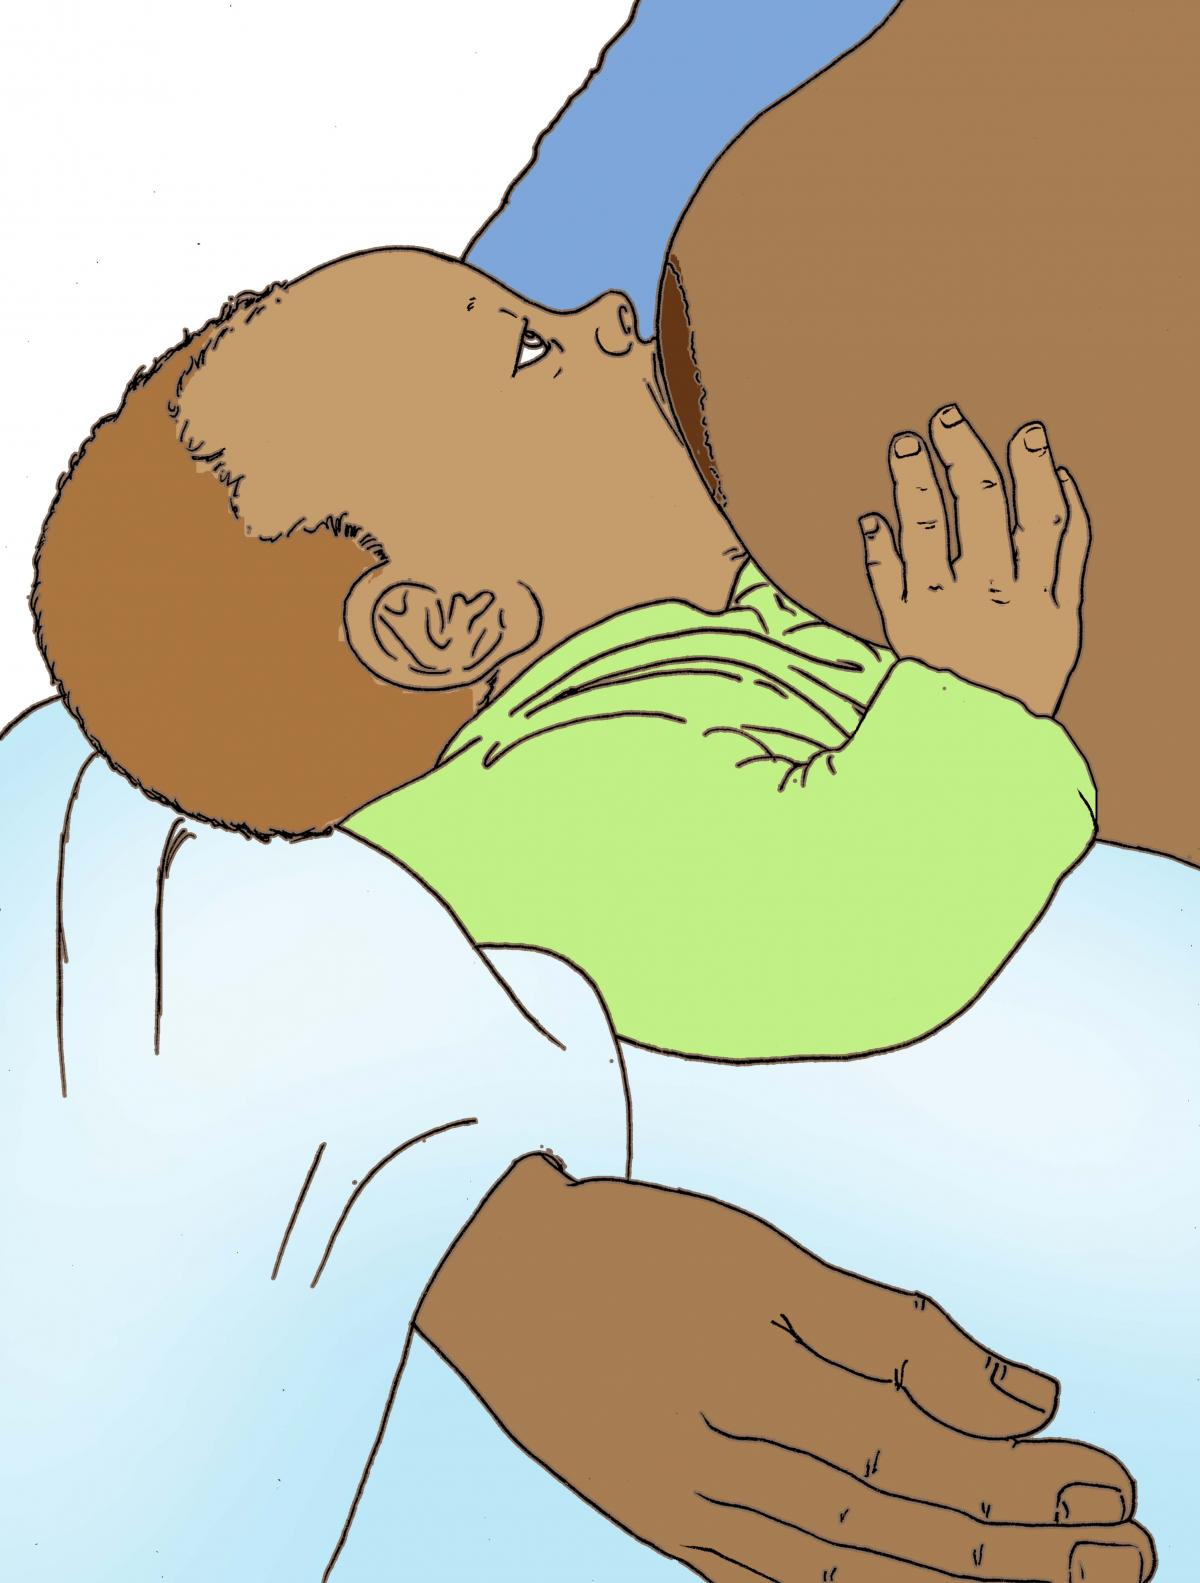 Breastfeeding - Breastfeeding good attachment - 06B - Non-country specific